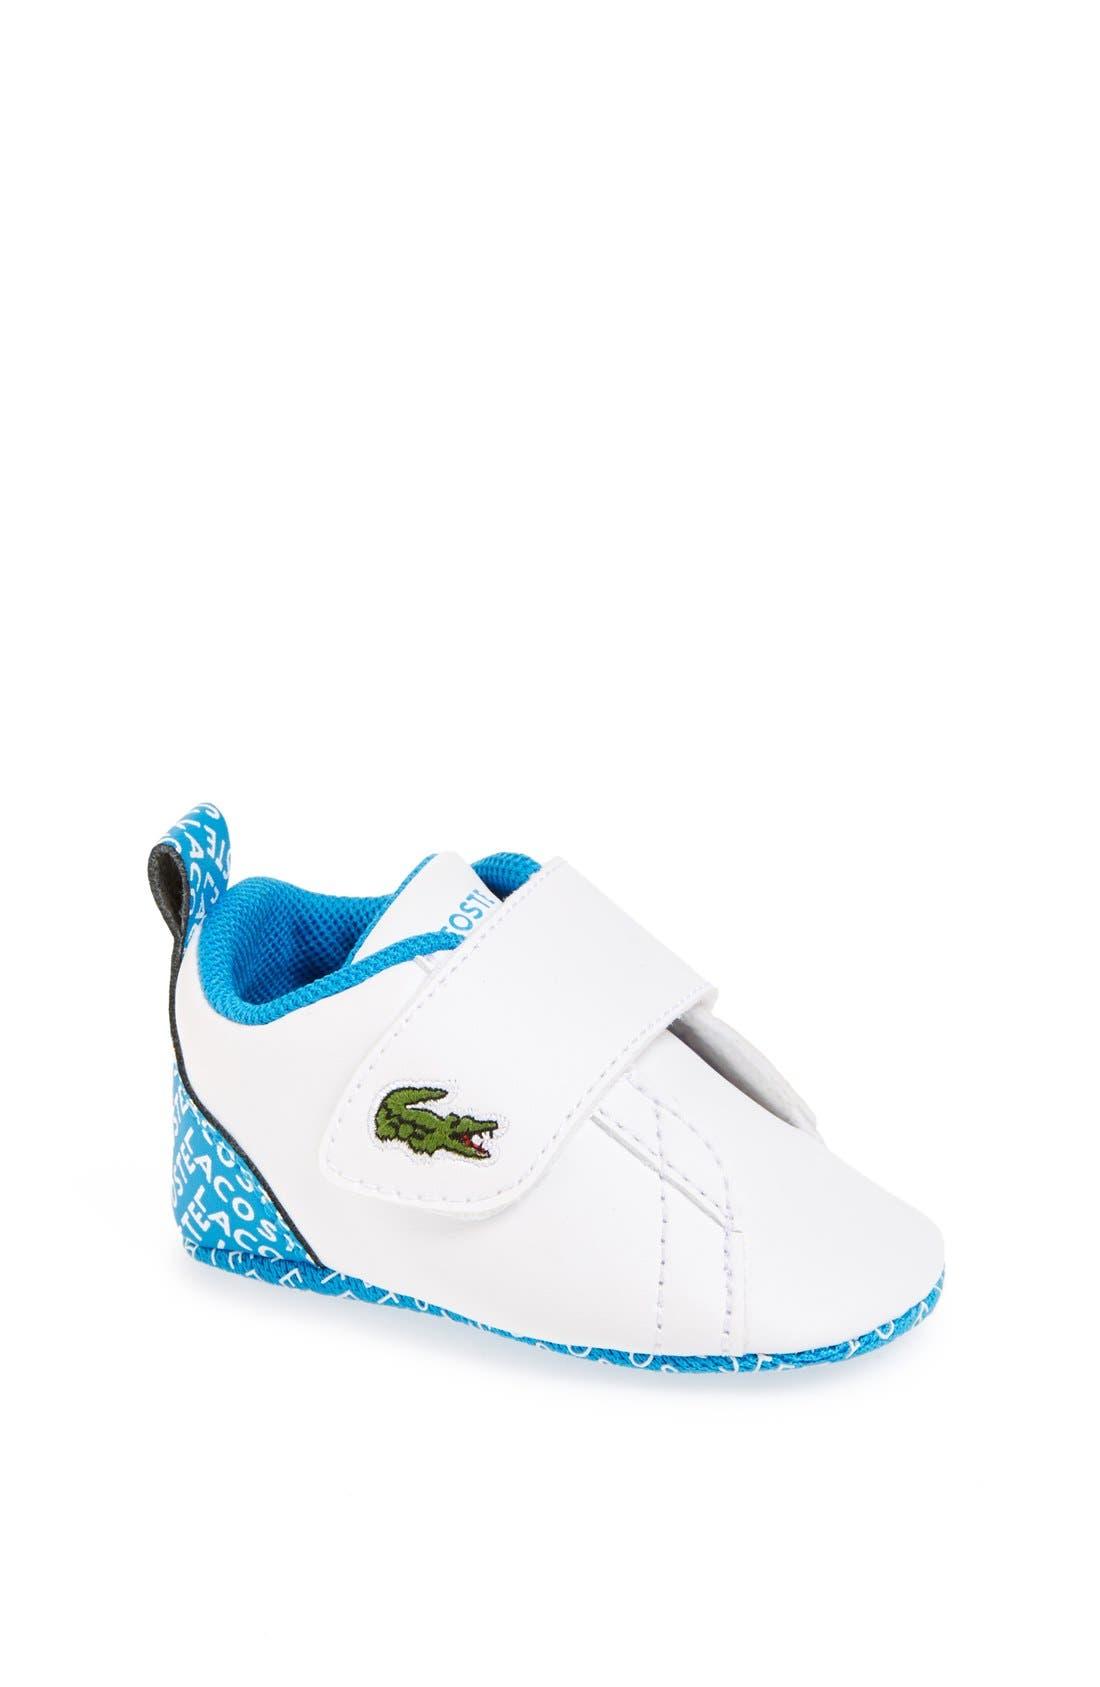 Main Image - Lacoste 'Paris Babe' Crib Shoe (Baby)